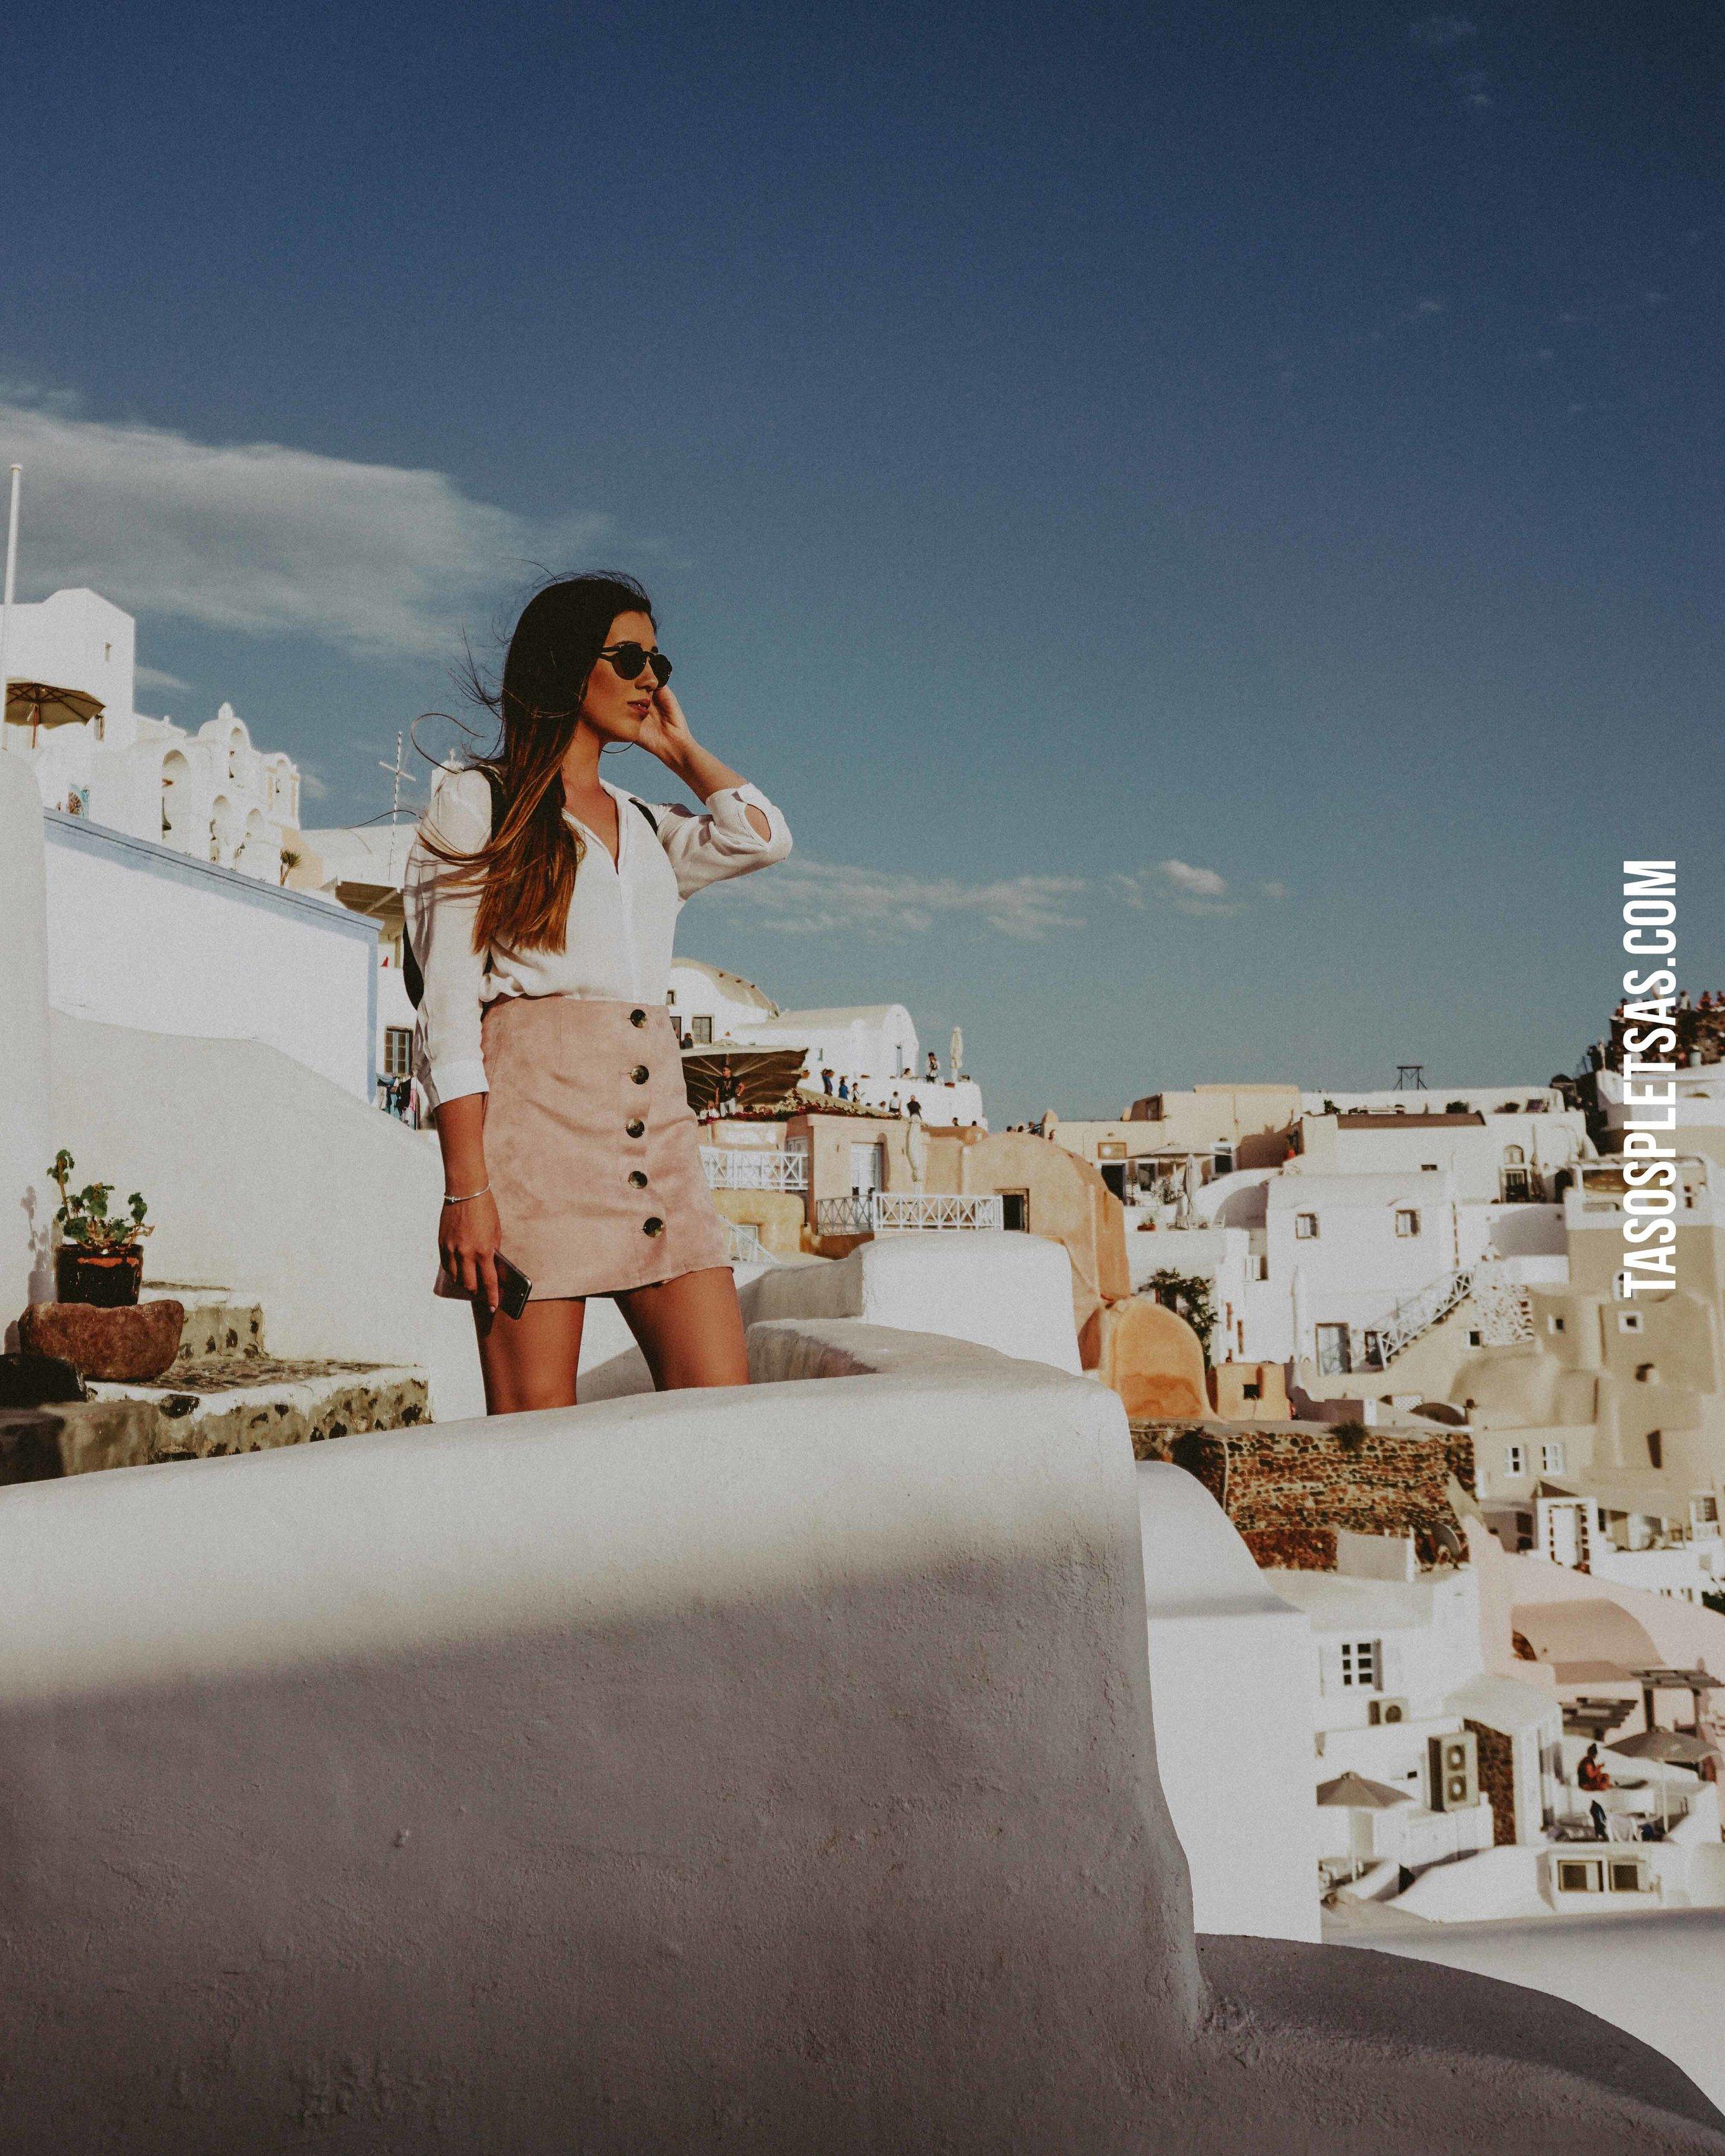 Lifestyle WEB-Santorini-2-DSC06390 copy.jpg